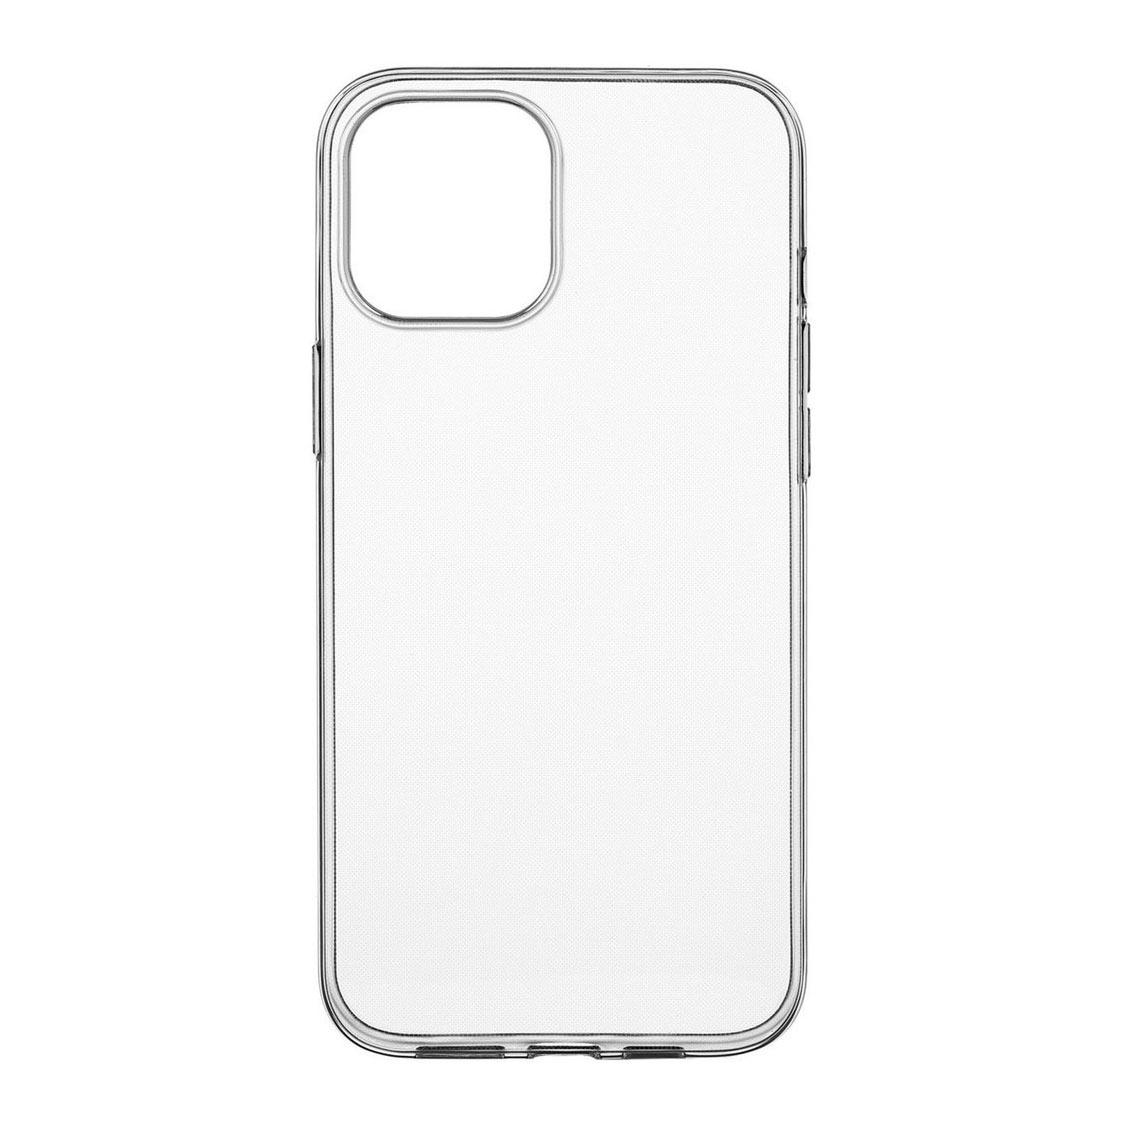 Чехол uBear Tone Case для смартфона Apple iPhone 12 mini, прозрачный текстурированный чехол ubear tone case для apple iphone xs max прозрачный